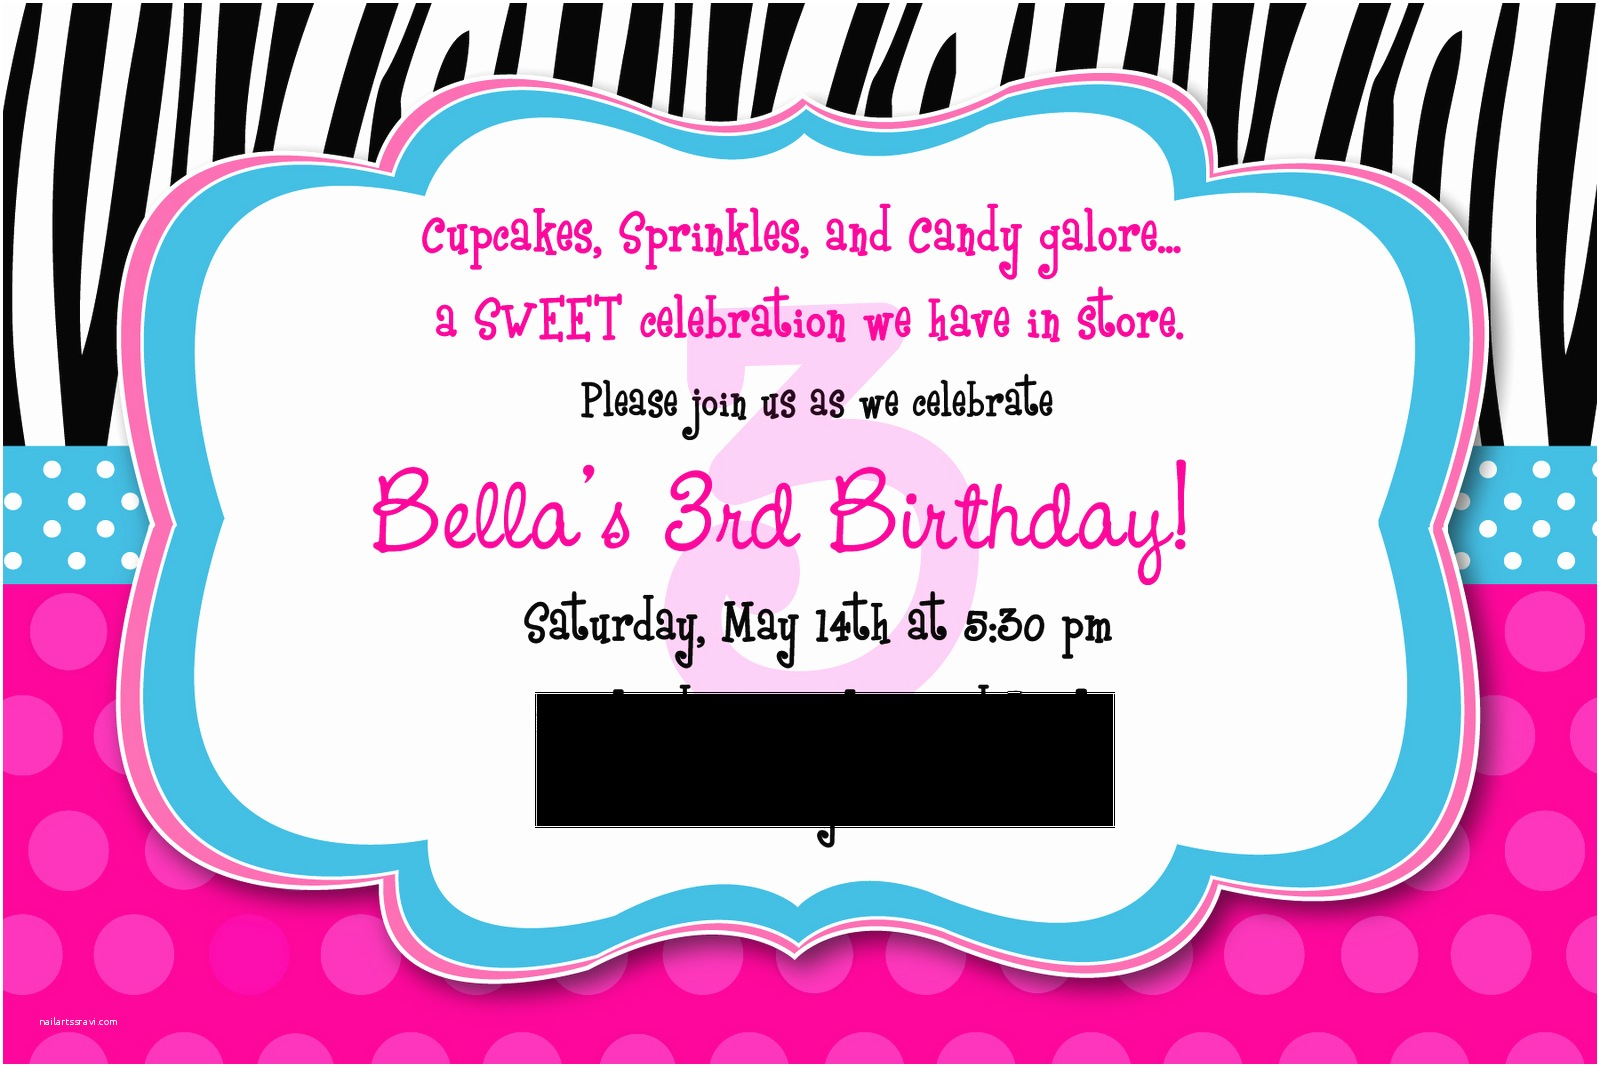 3rd Birthday Invitation Wording 3rd Birthday Invitation Wording –